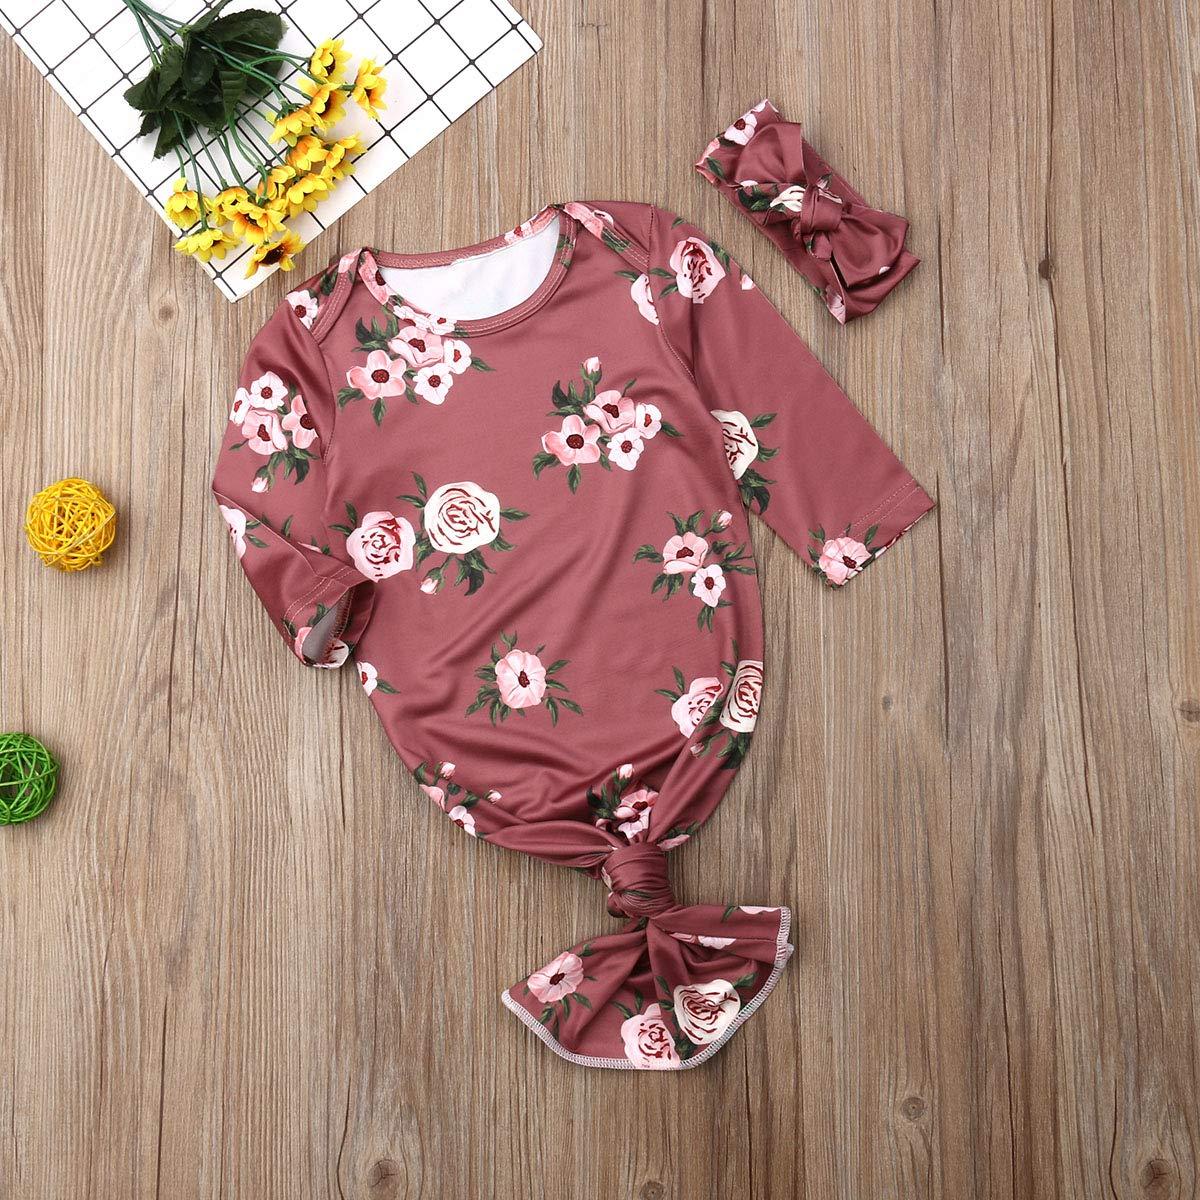 sushine Newborn Baby Sleepy Floral Striped Gown Headband Sleepwear Romper Sleeping Bags E-Red Stripe Headband, 0-6 Months